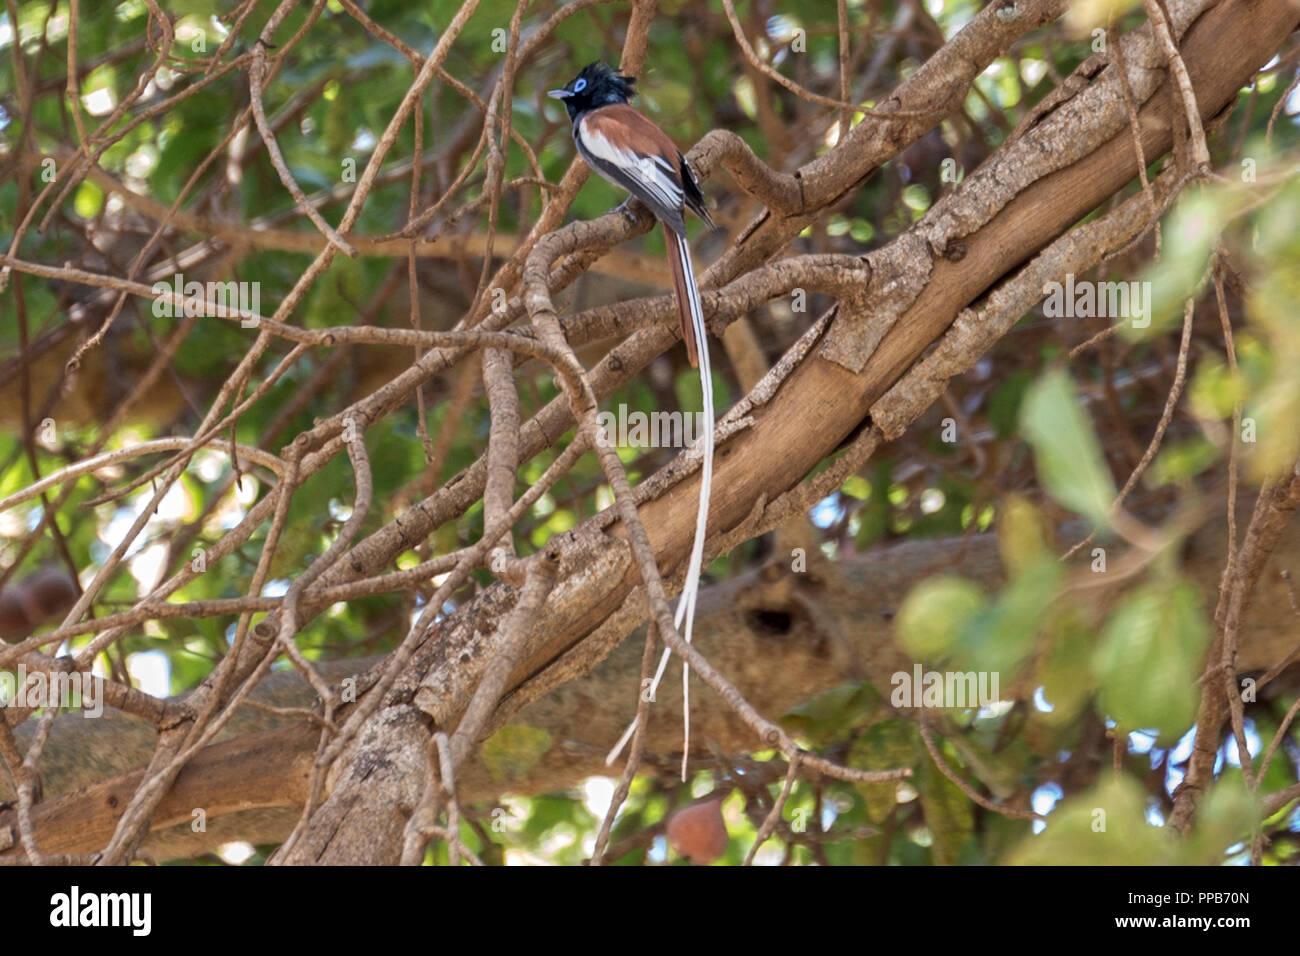 Male  Red-bellied paradise flycatcher (Terpsiphone rufiventer), aka black-headed paradise flycatcher,Dolo Mena, Oromia Region, Ethiopia Stock Photo